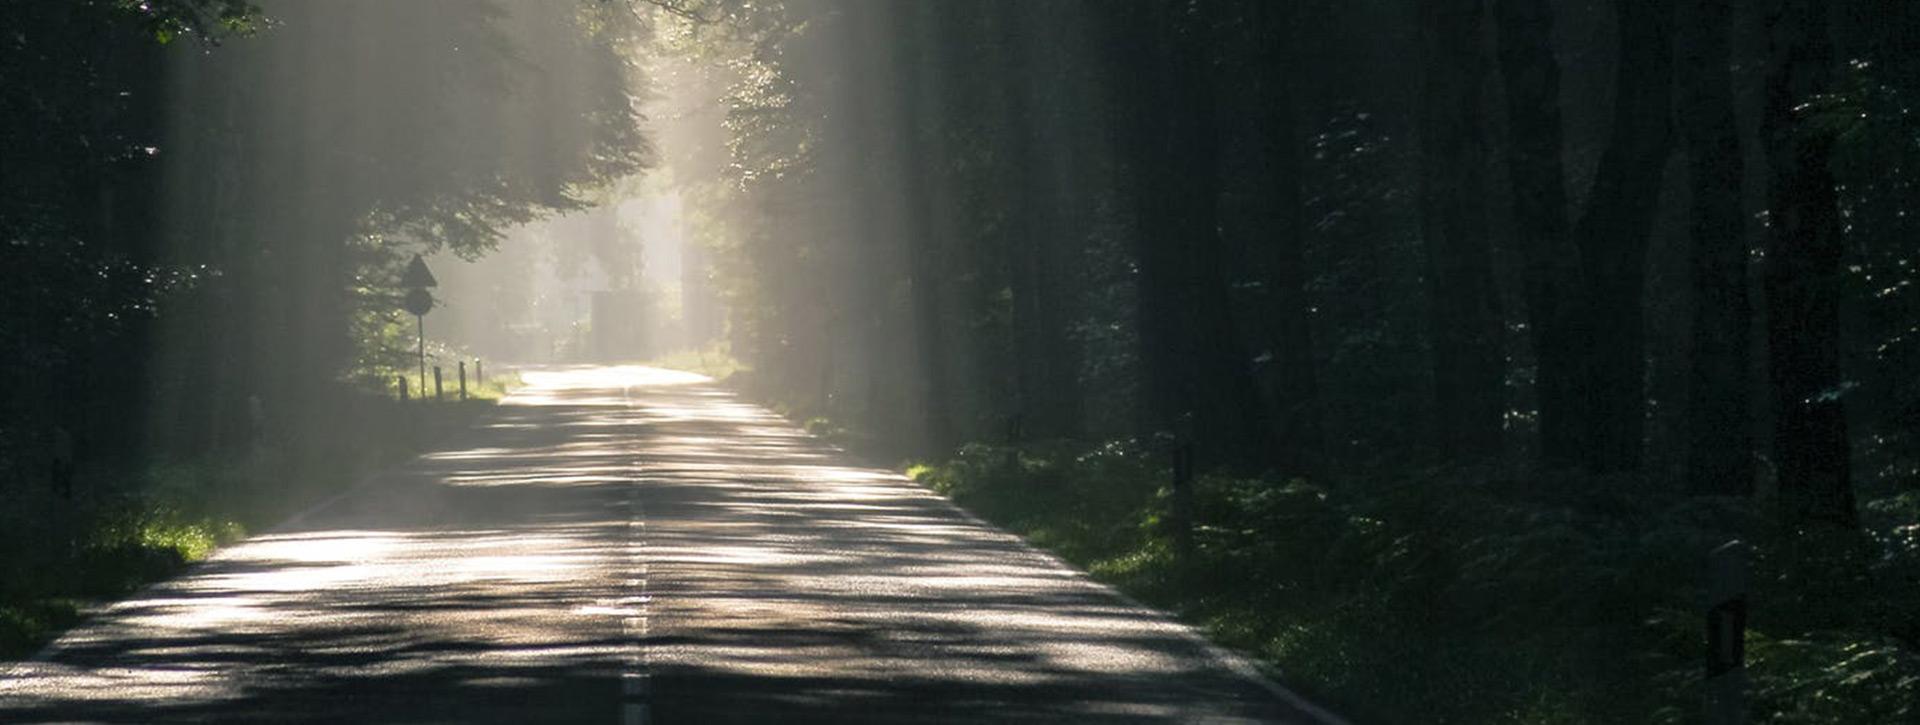 7 Ways to Thrive & Progress Every Day